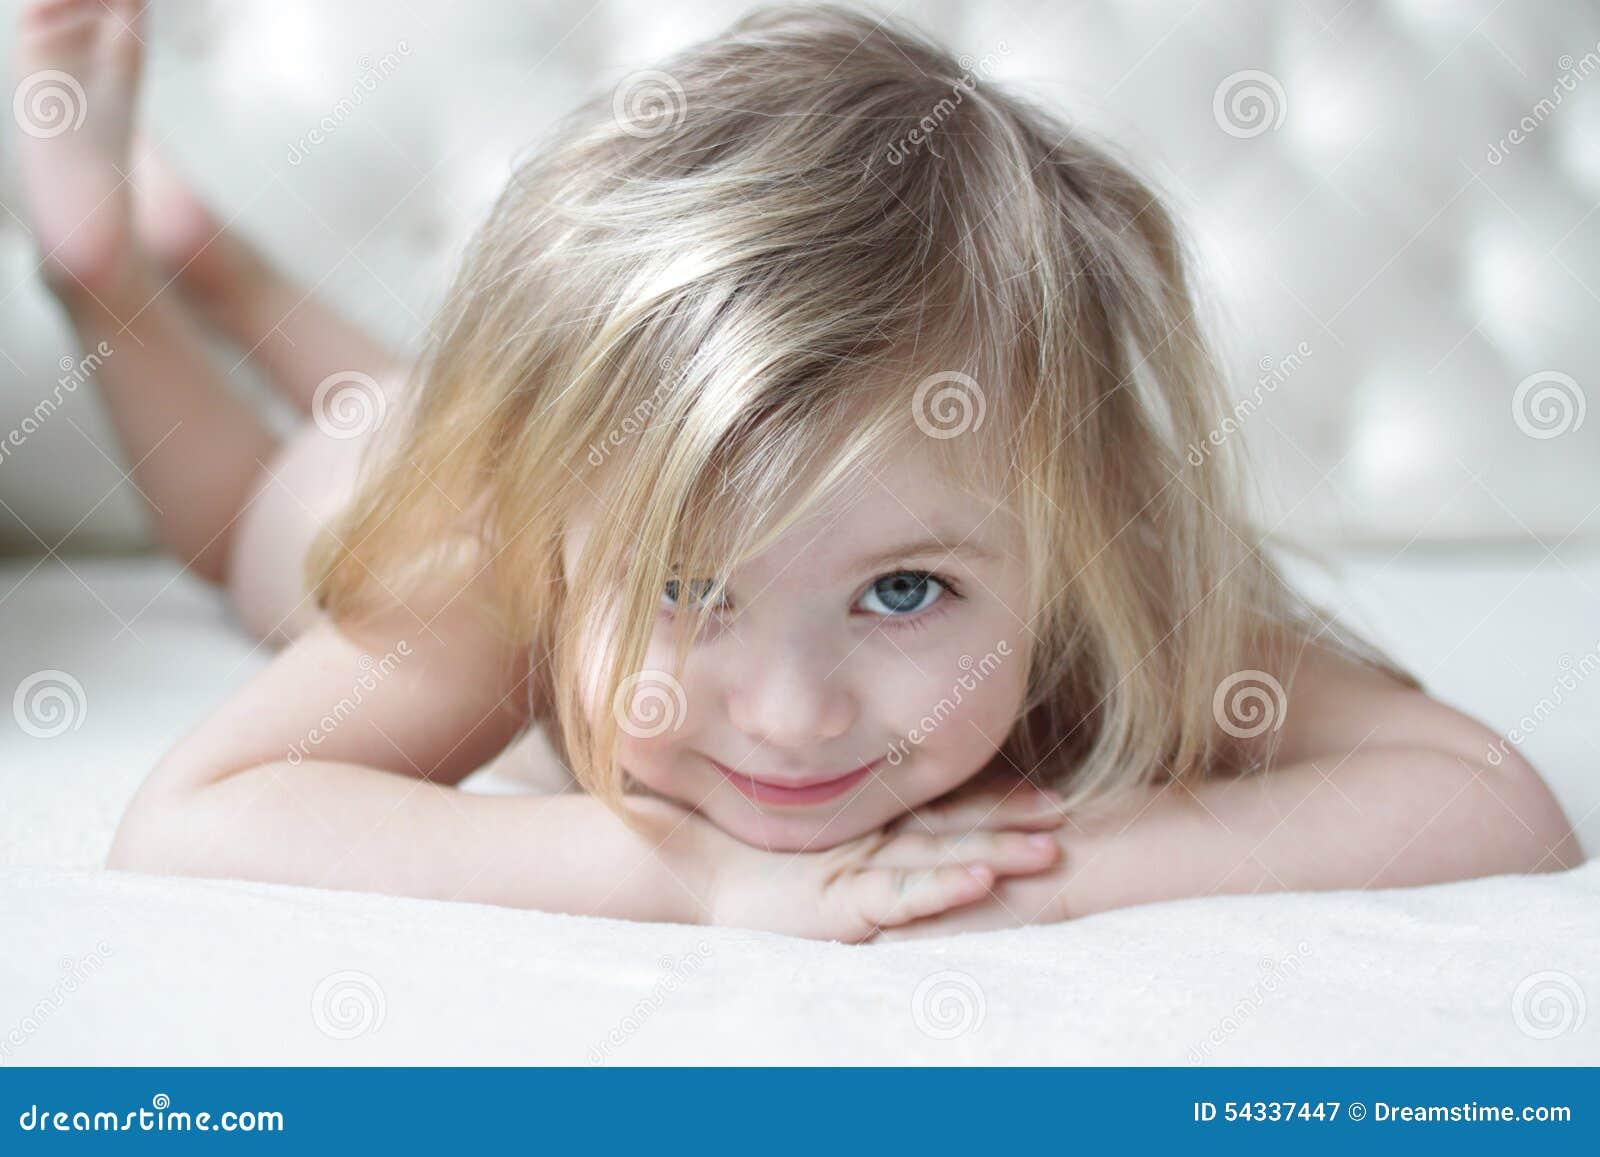 Little Girl Stock Photo Image 54337447